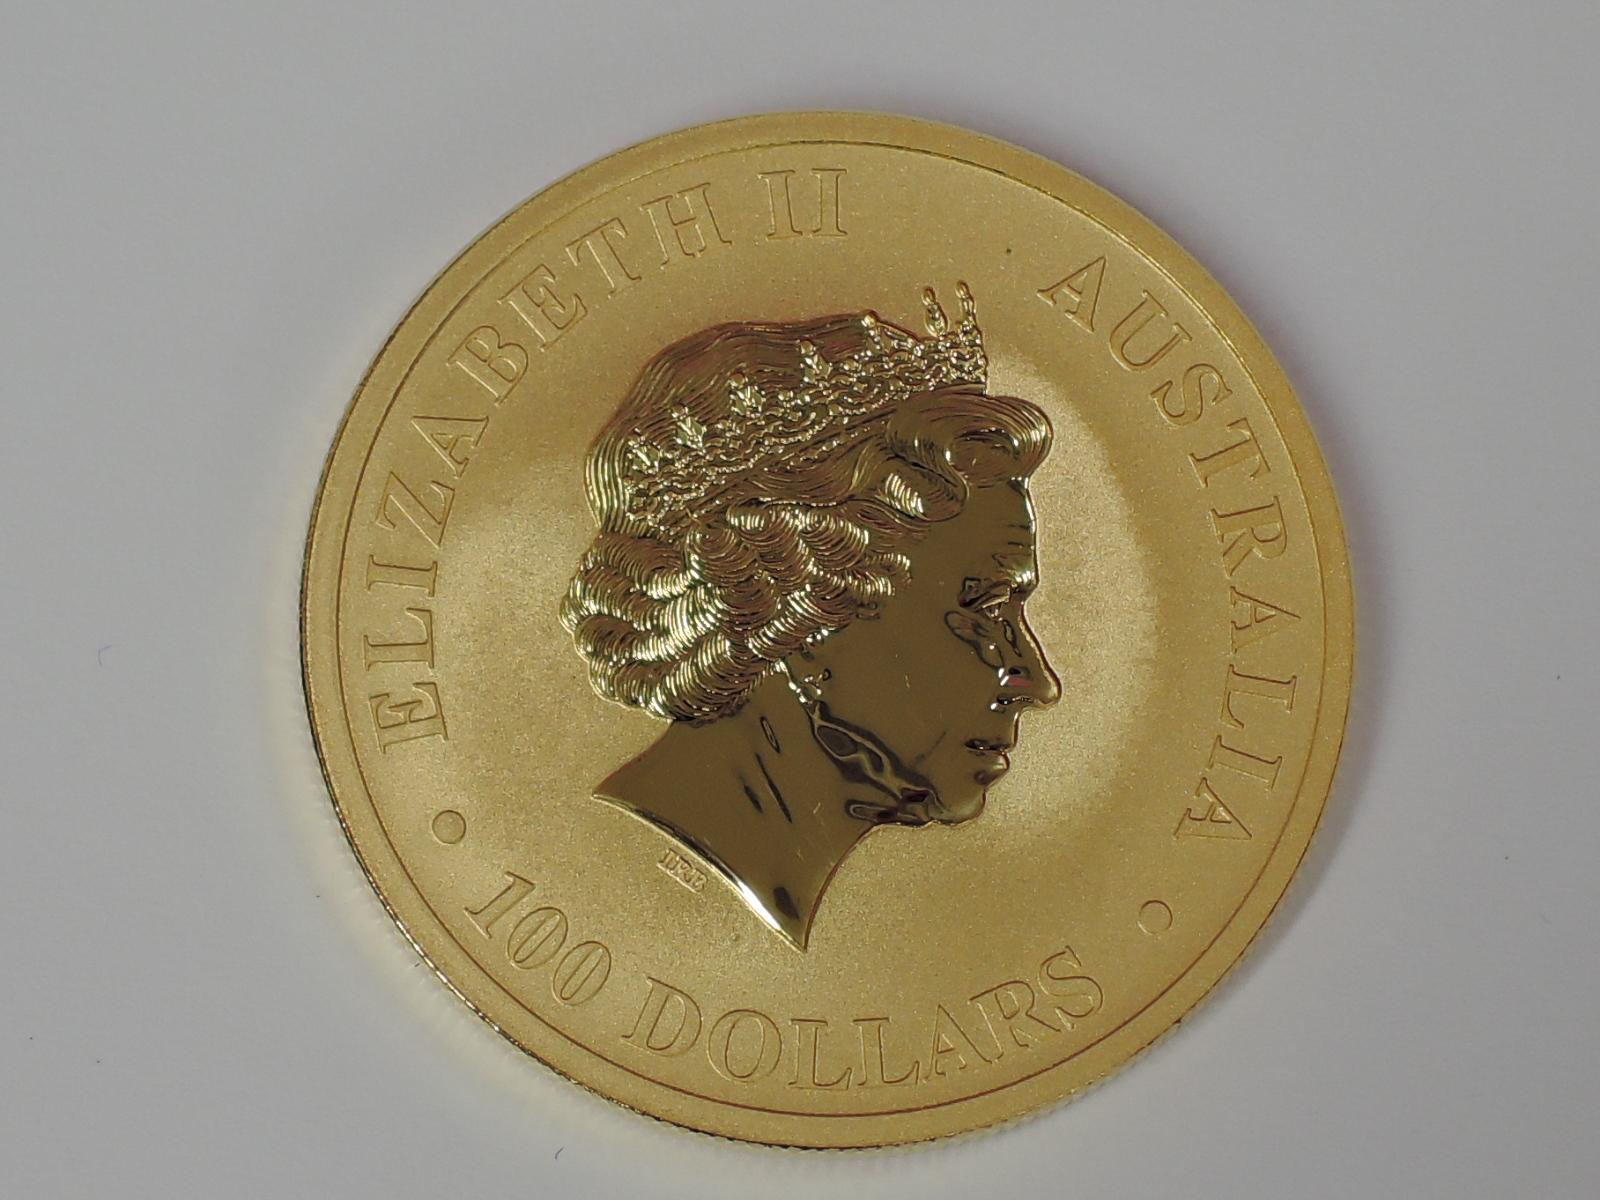 Lot 607 - A gold 1oz 2014 100 dollar Australian Kangaroo coin, in plastic case